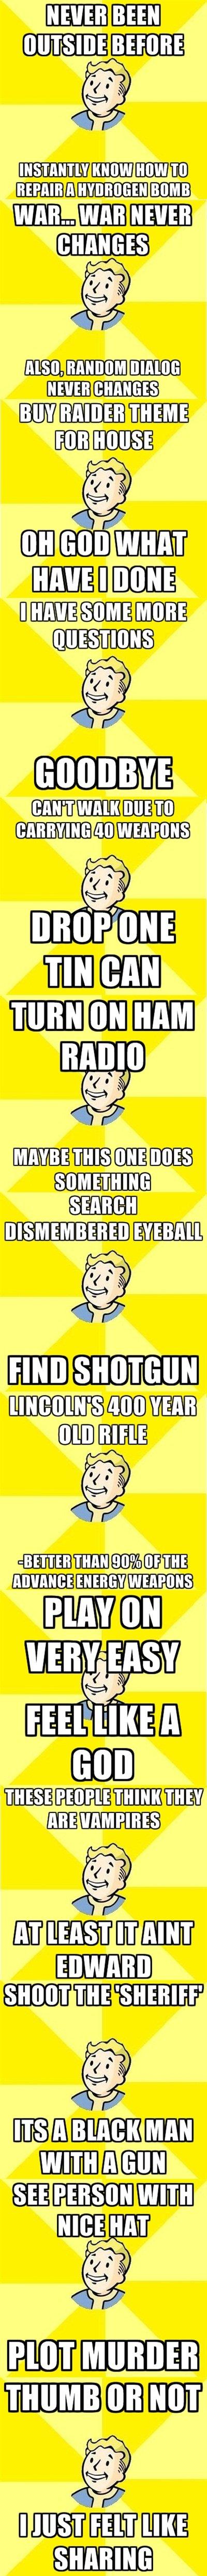 Fallout Comp. Oh no, it's Randal Rapist Mcgee!. Ifirst]. FALLOUT! Fallout Comp Oh no it's Randal Rapist Mcgee! Ifirst] FALLOUT!